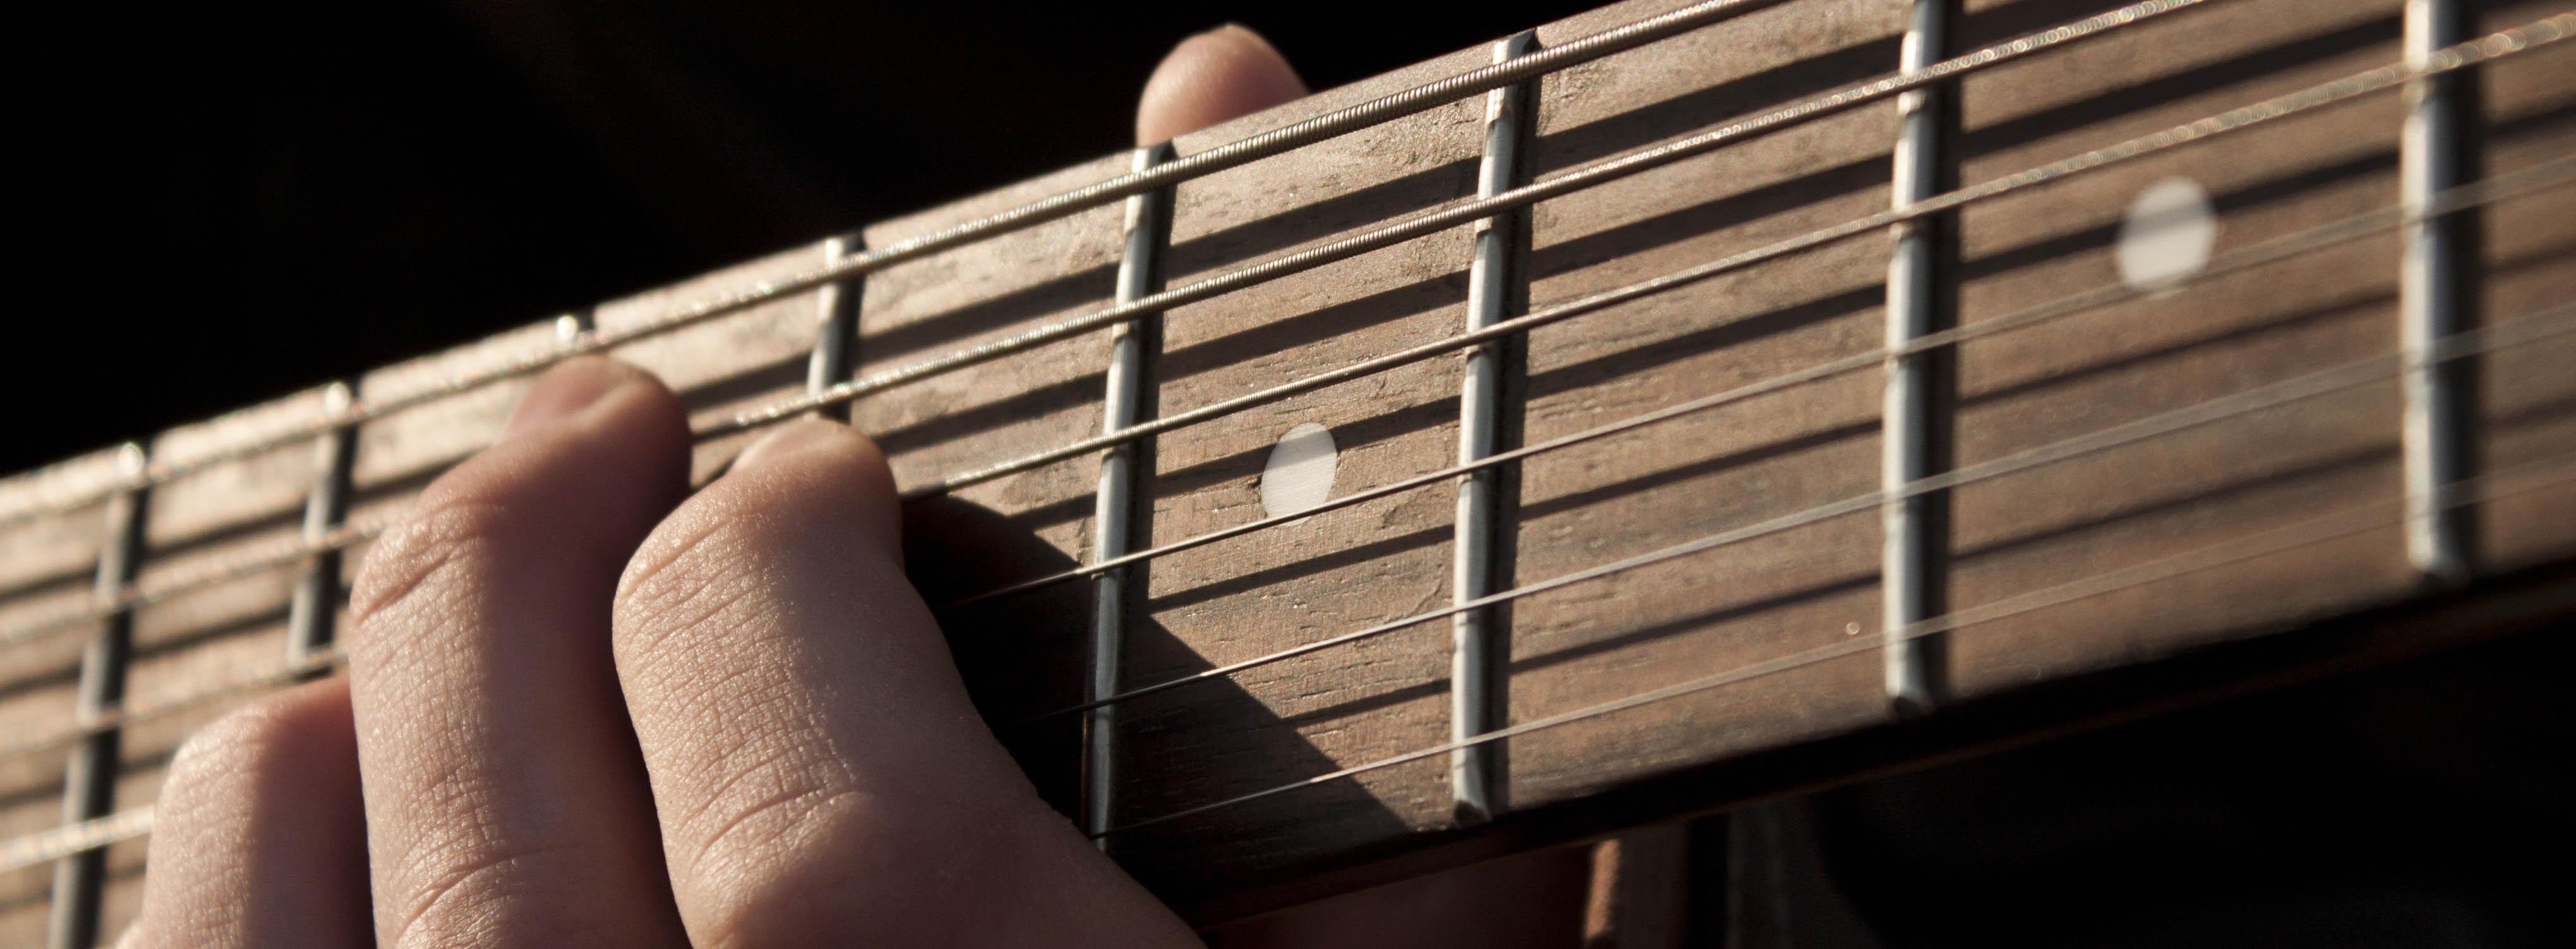 Legato People Musicotherapie